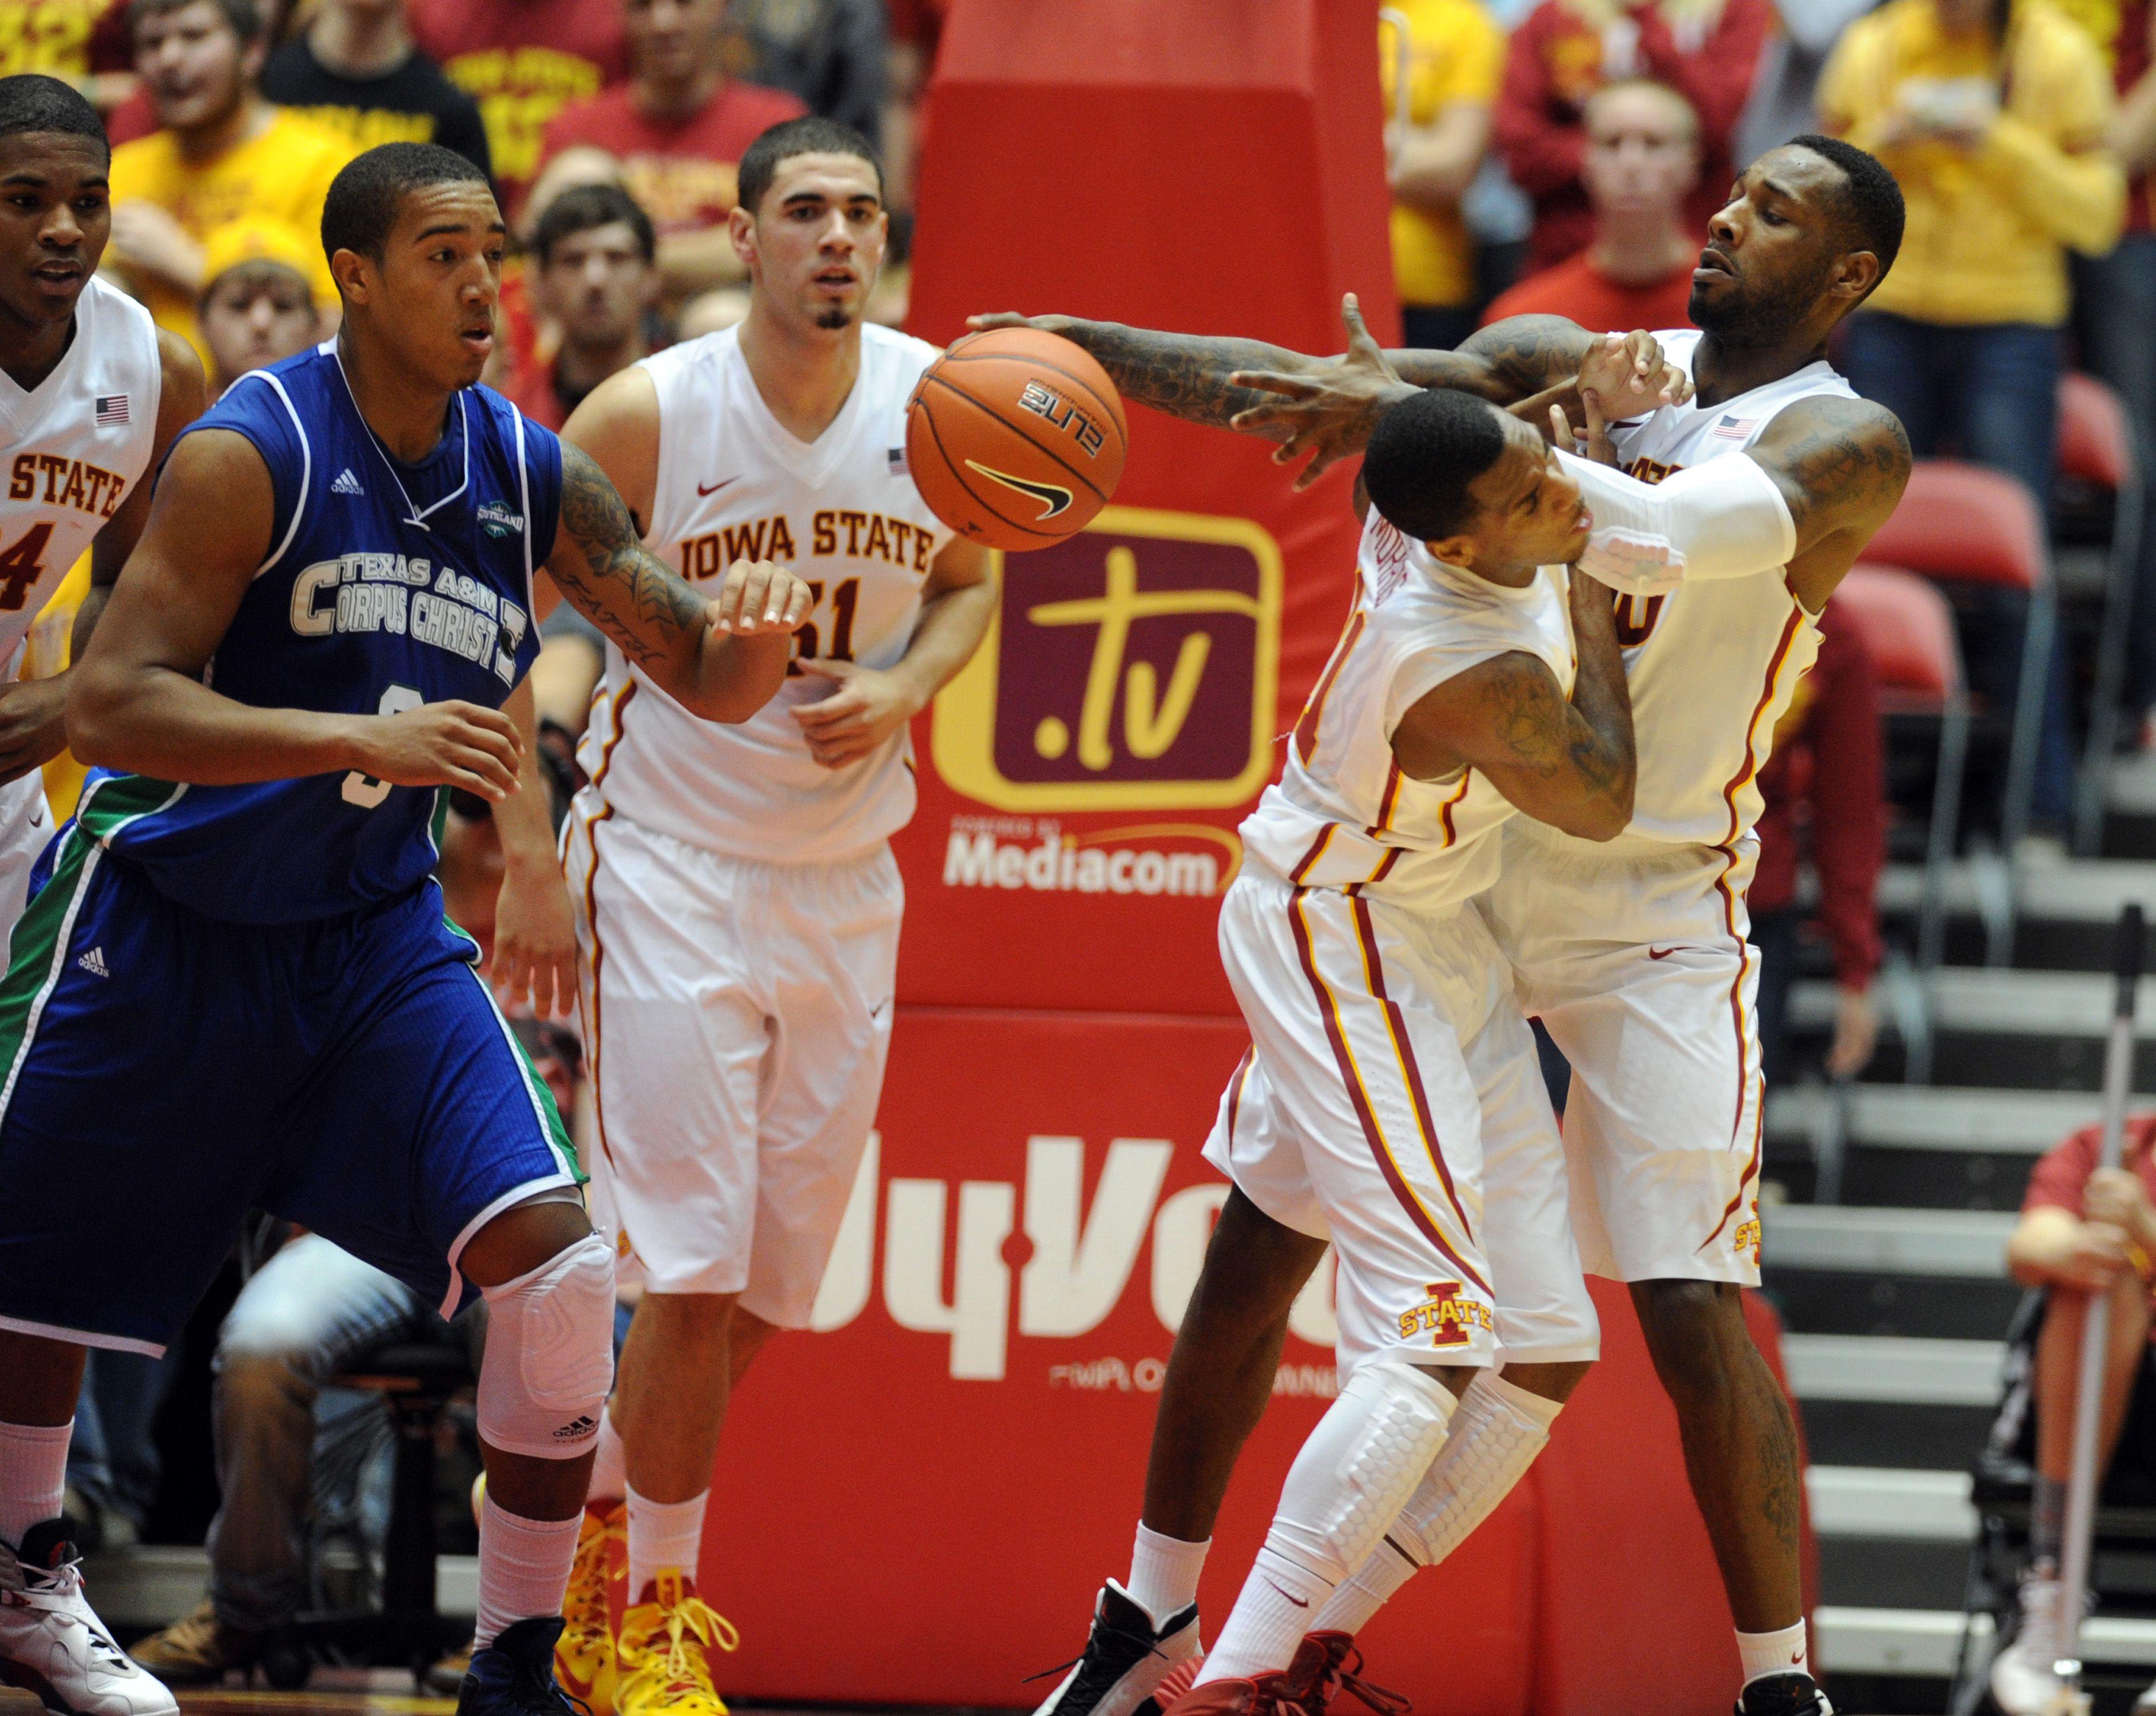 Iowa State S Deandre Kane Steals The Ball From Texas A M Corpus Christi S Zane Knowles On Tuesday Photo By Nirmalendu Maju Iowa State Iowa State Cyclones Iowa